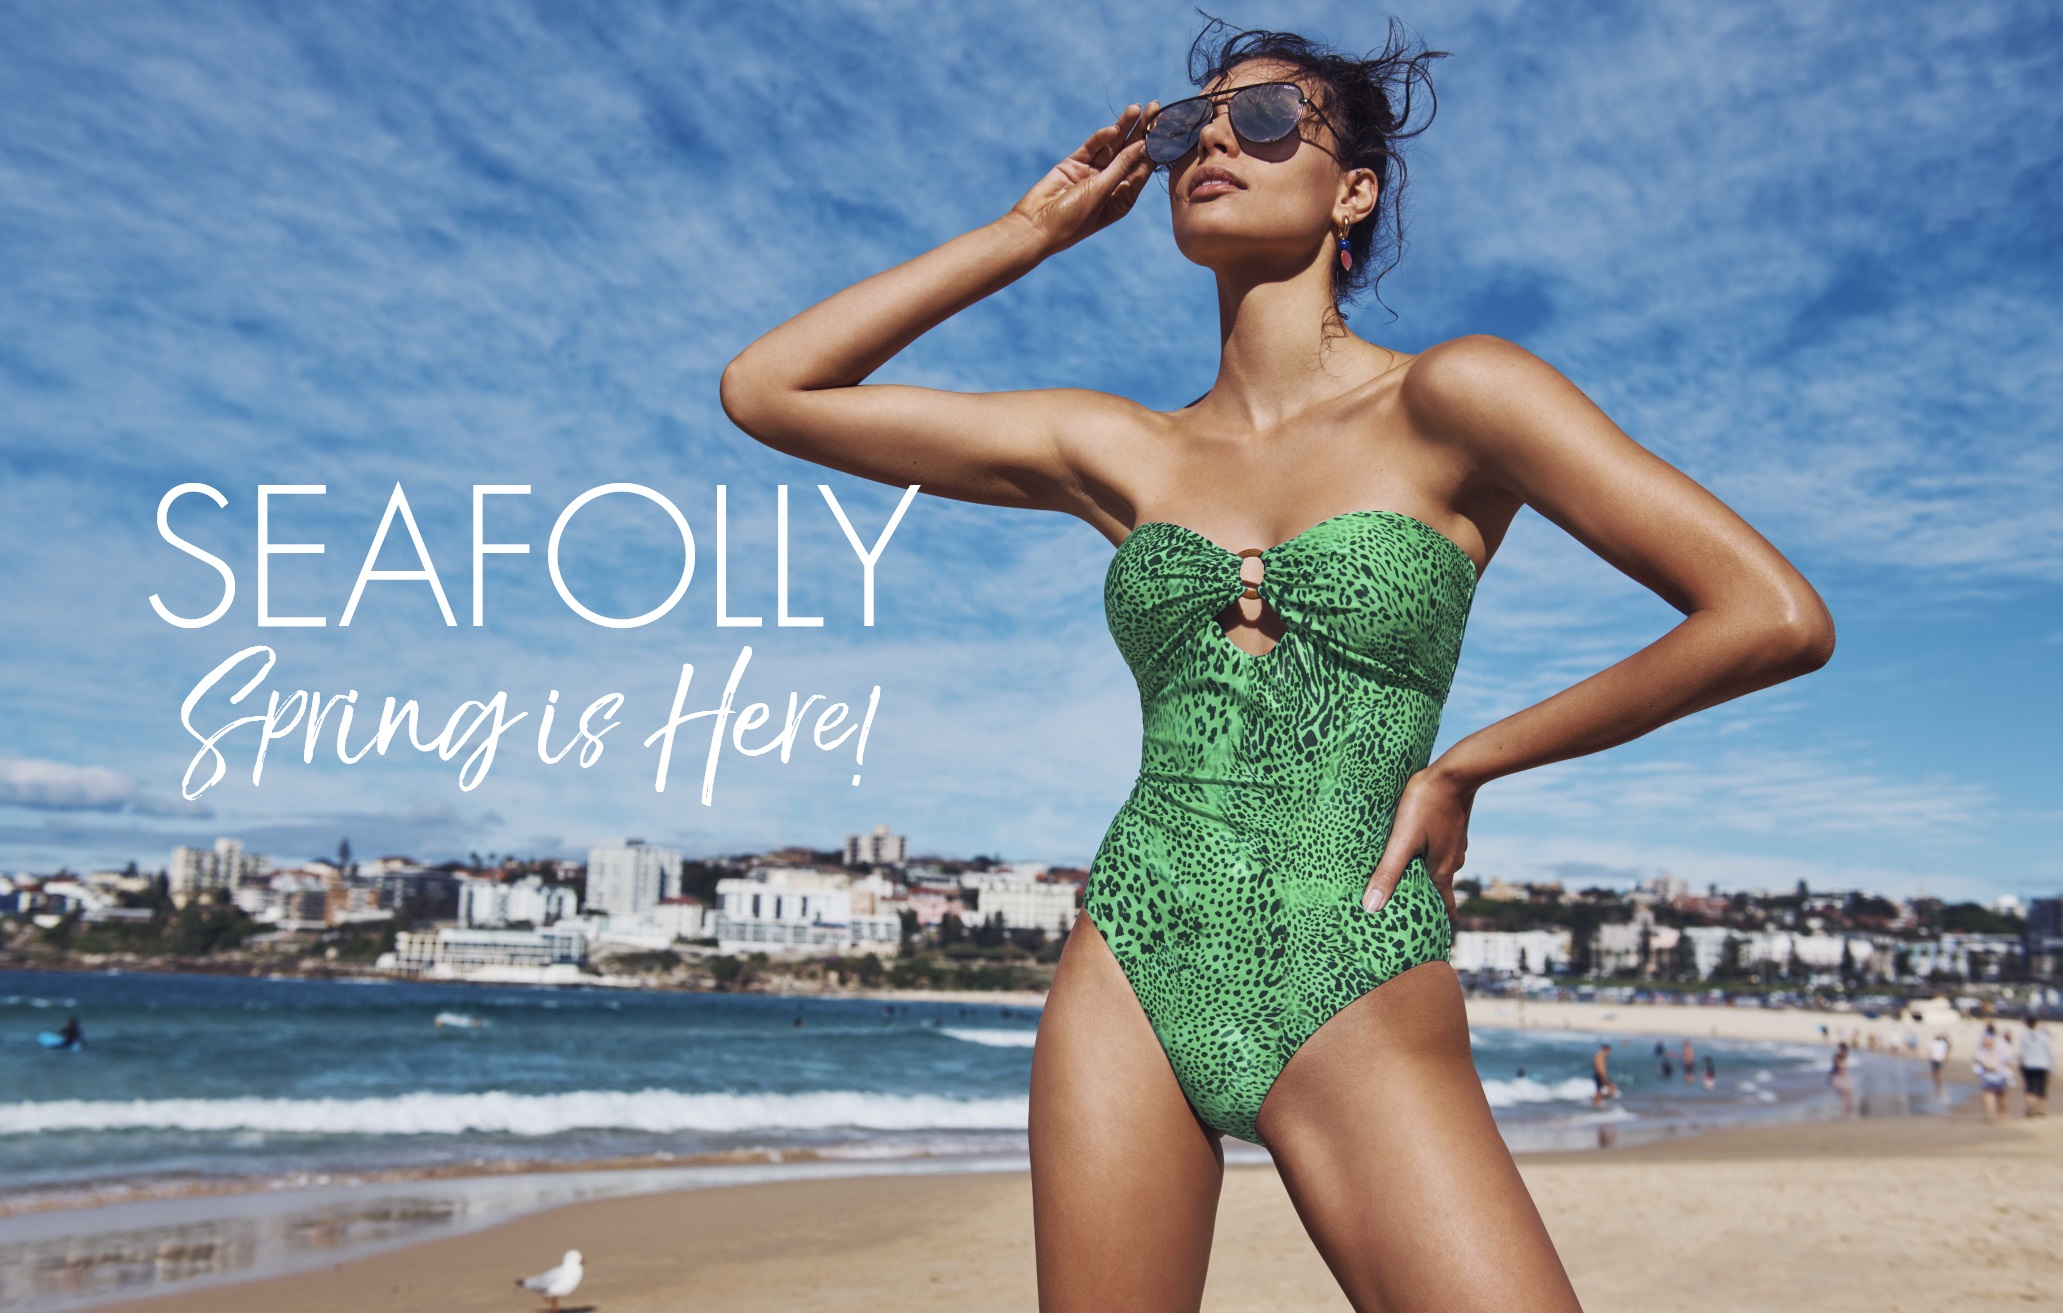 Seafolly swimwear 2021